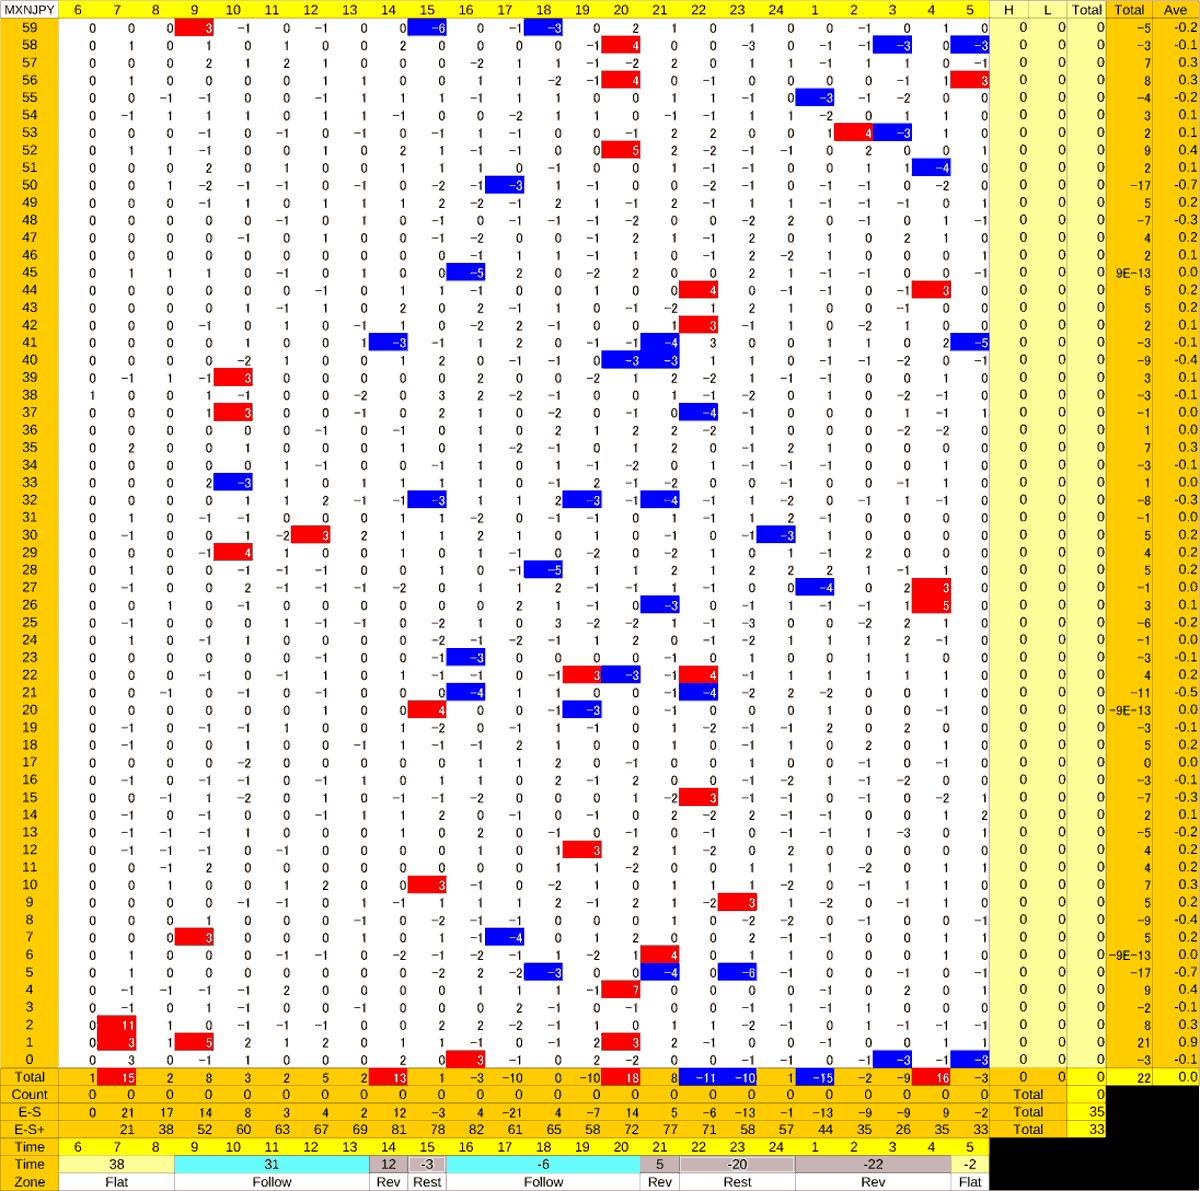 20200706_HS(3)MXNJPY